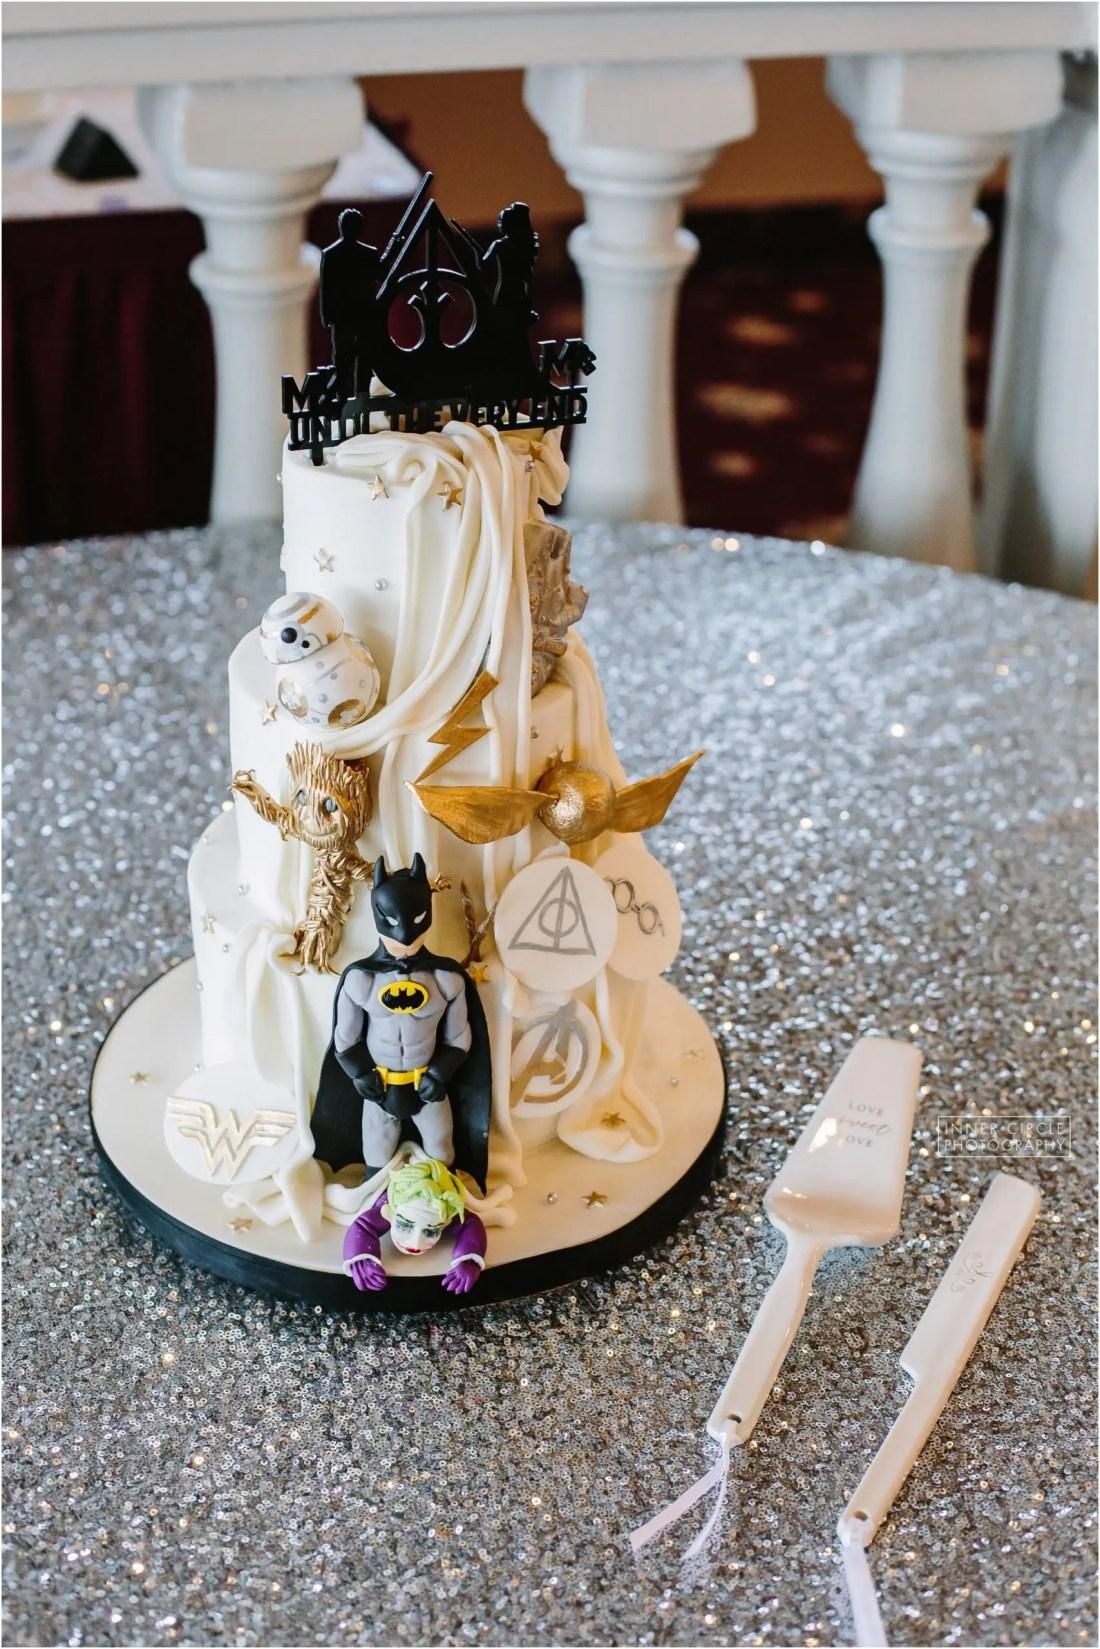 JustinHeather_WED11-2-2019_InnerCirclePhoto_771-1-scaled Engagement - Wedding  Michigan Photography